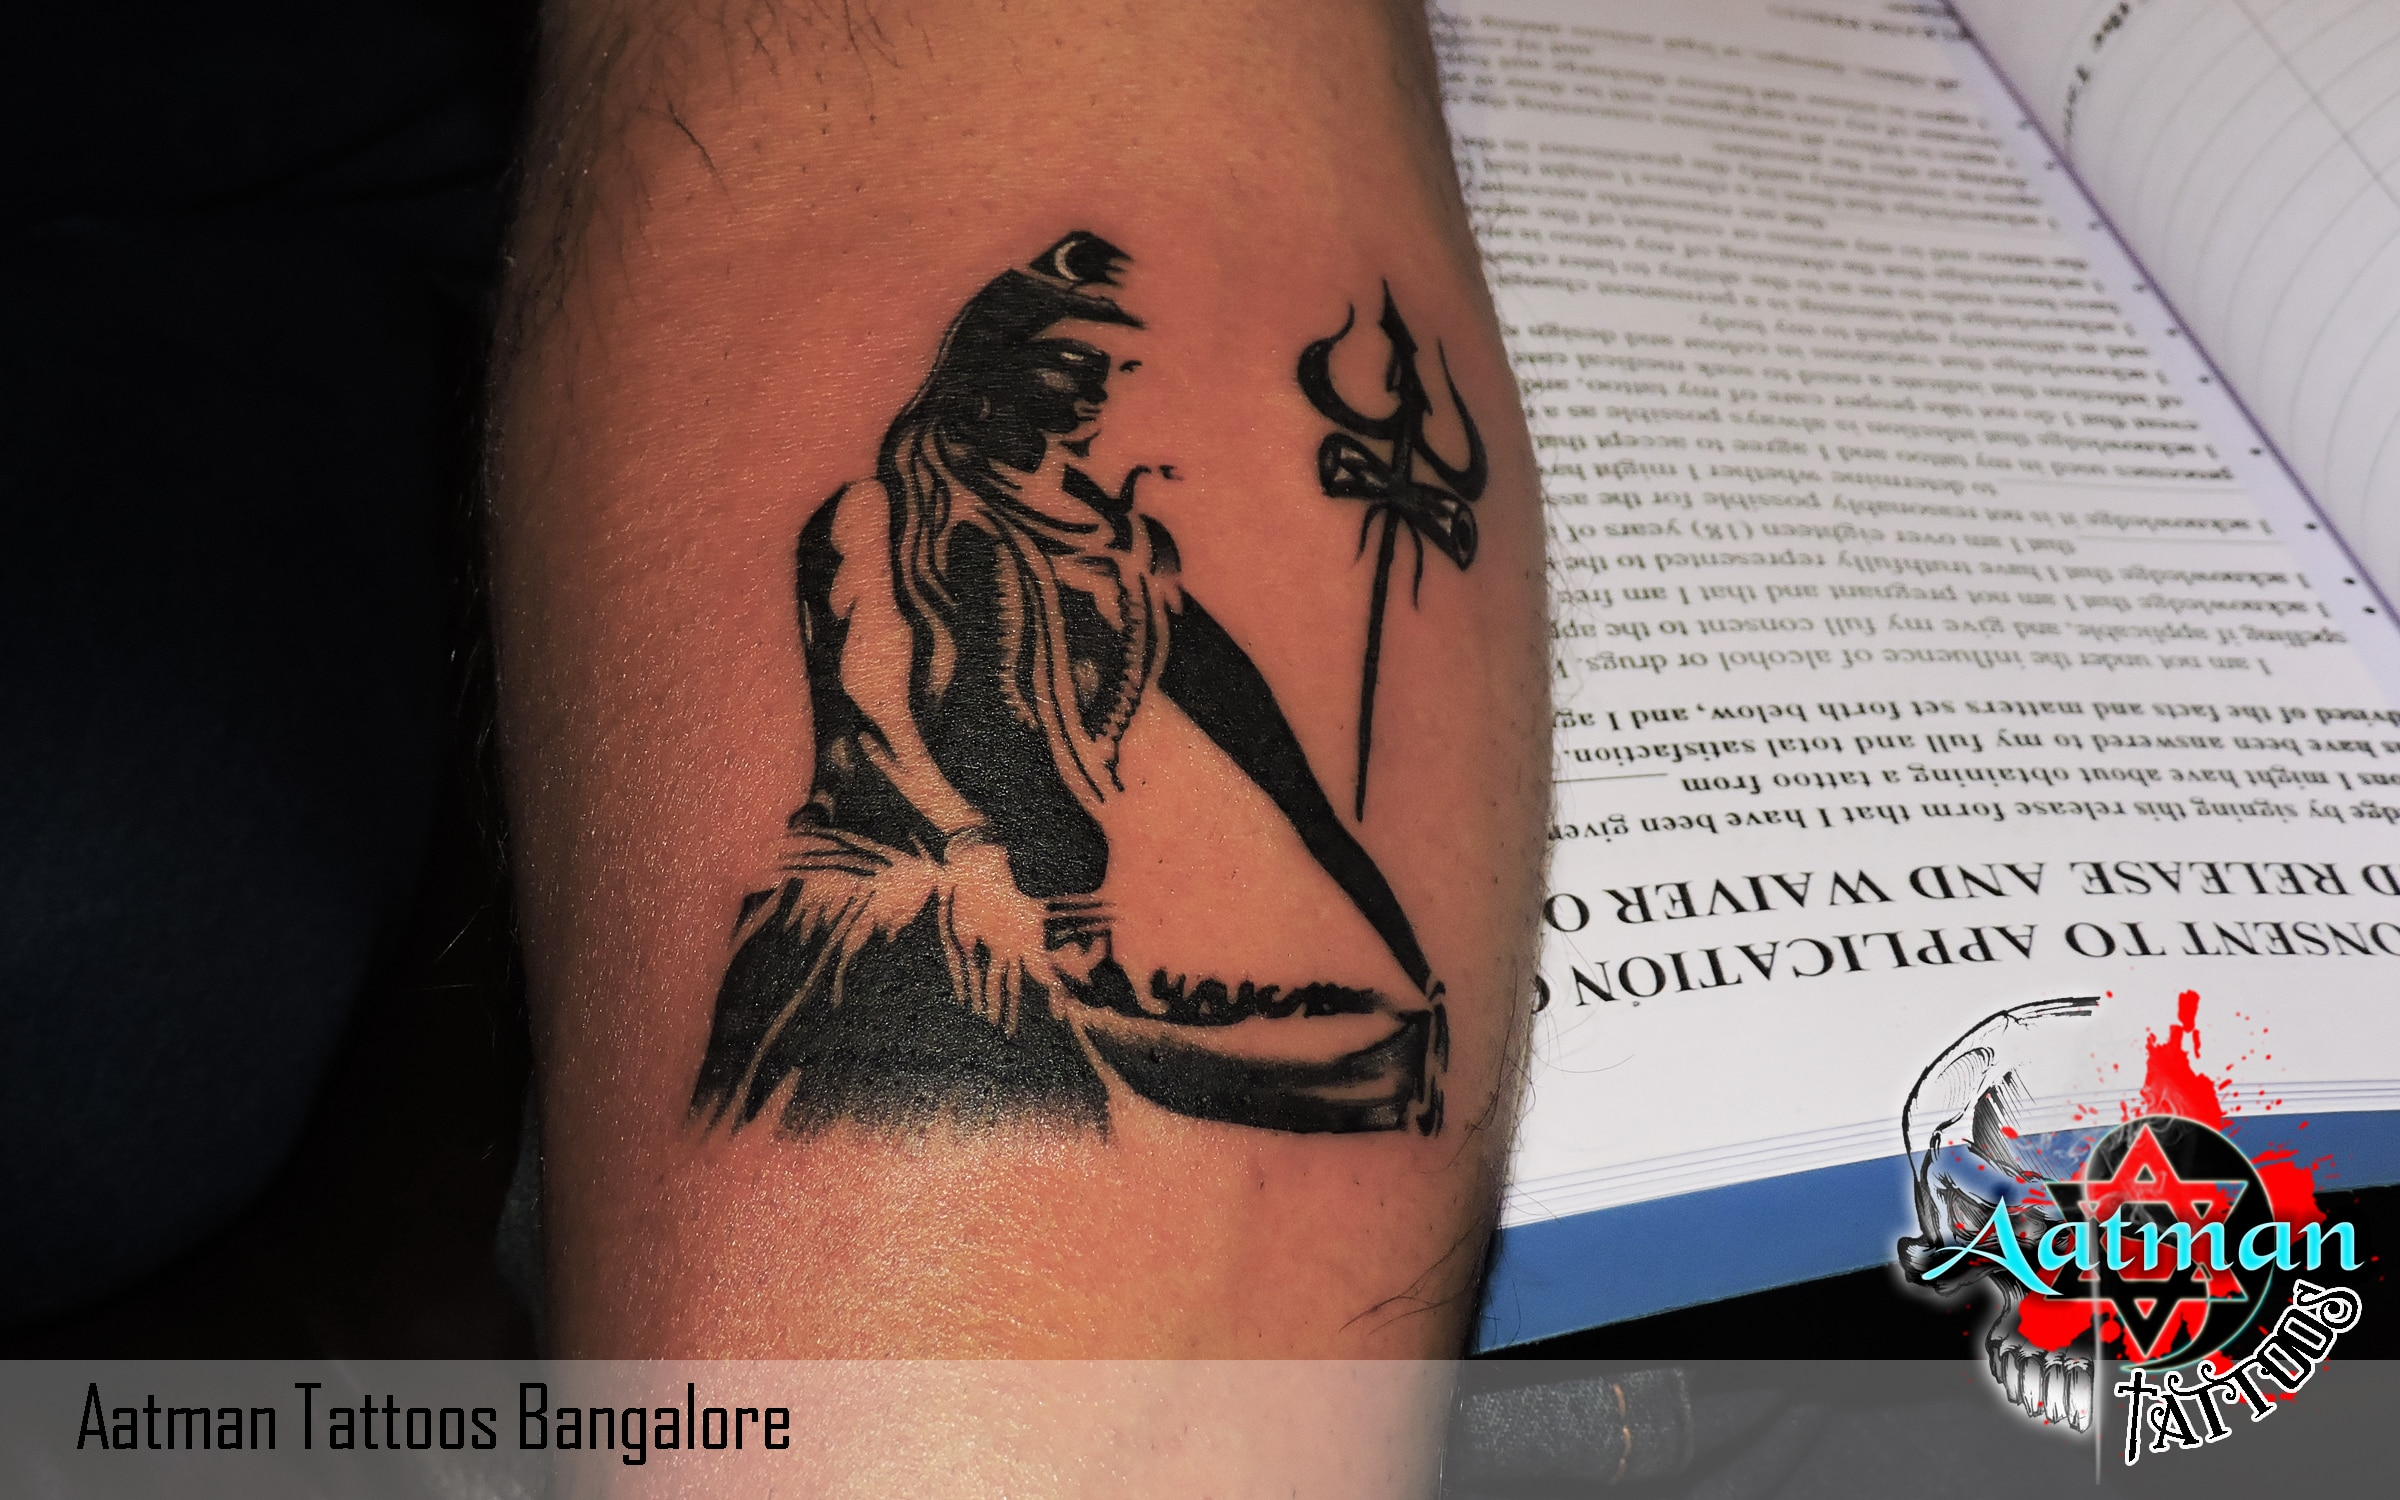 aatman tattoos reviewed aatman tattoos in bangalore india. Black Bedroom Furniture Sets. Home Design Ideas